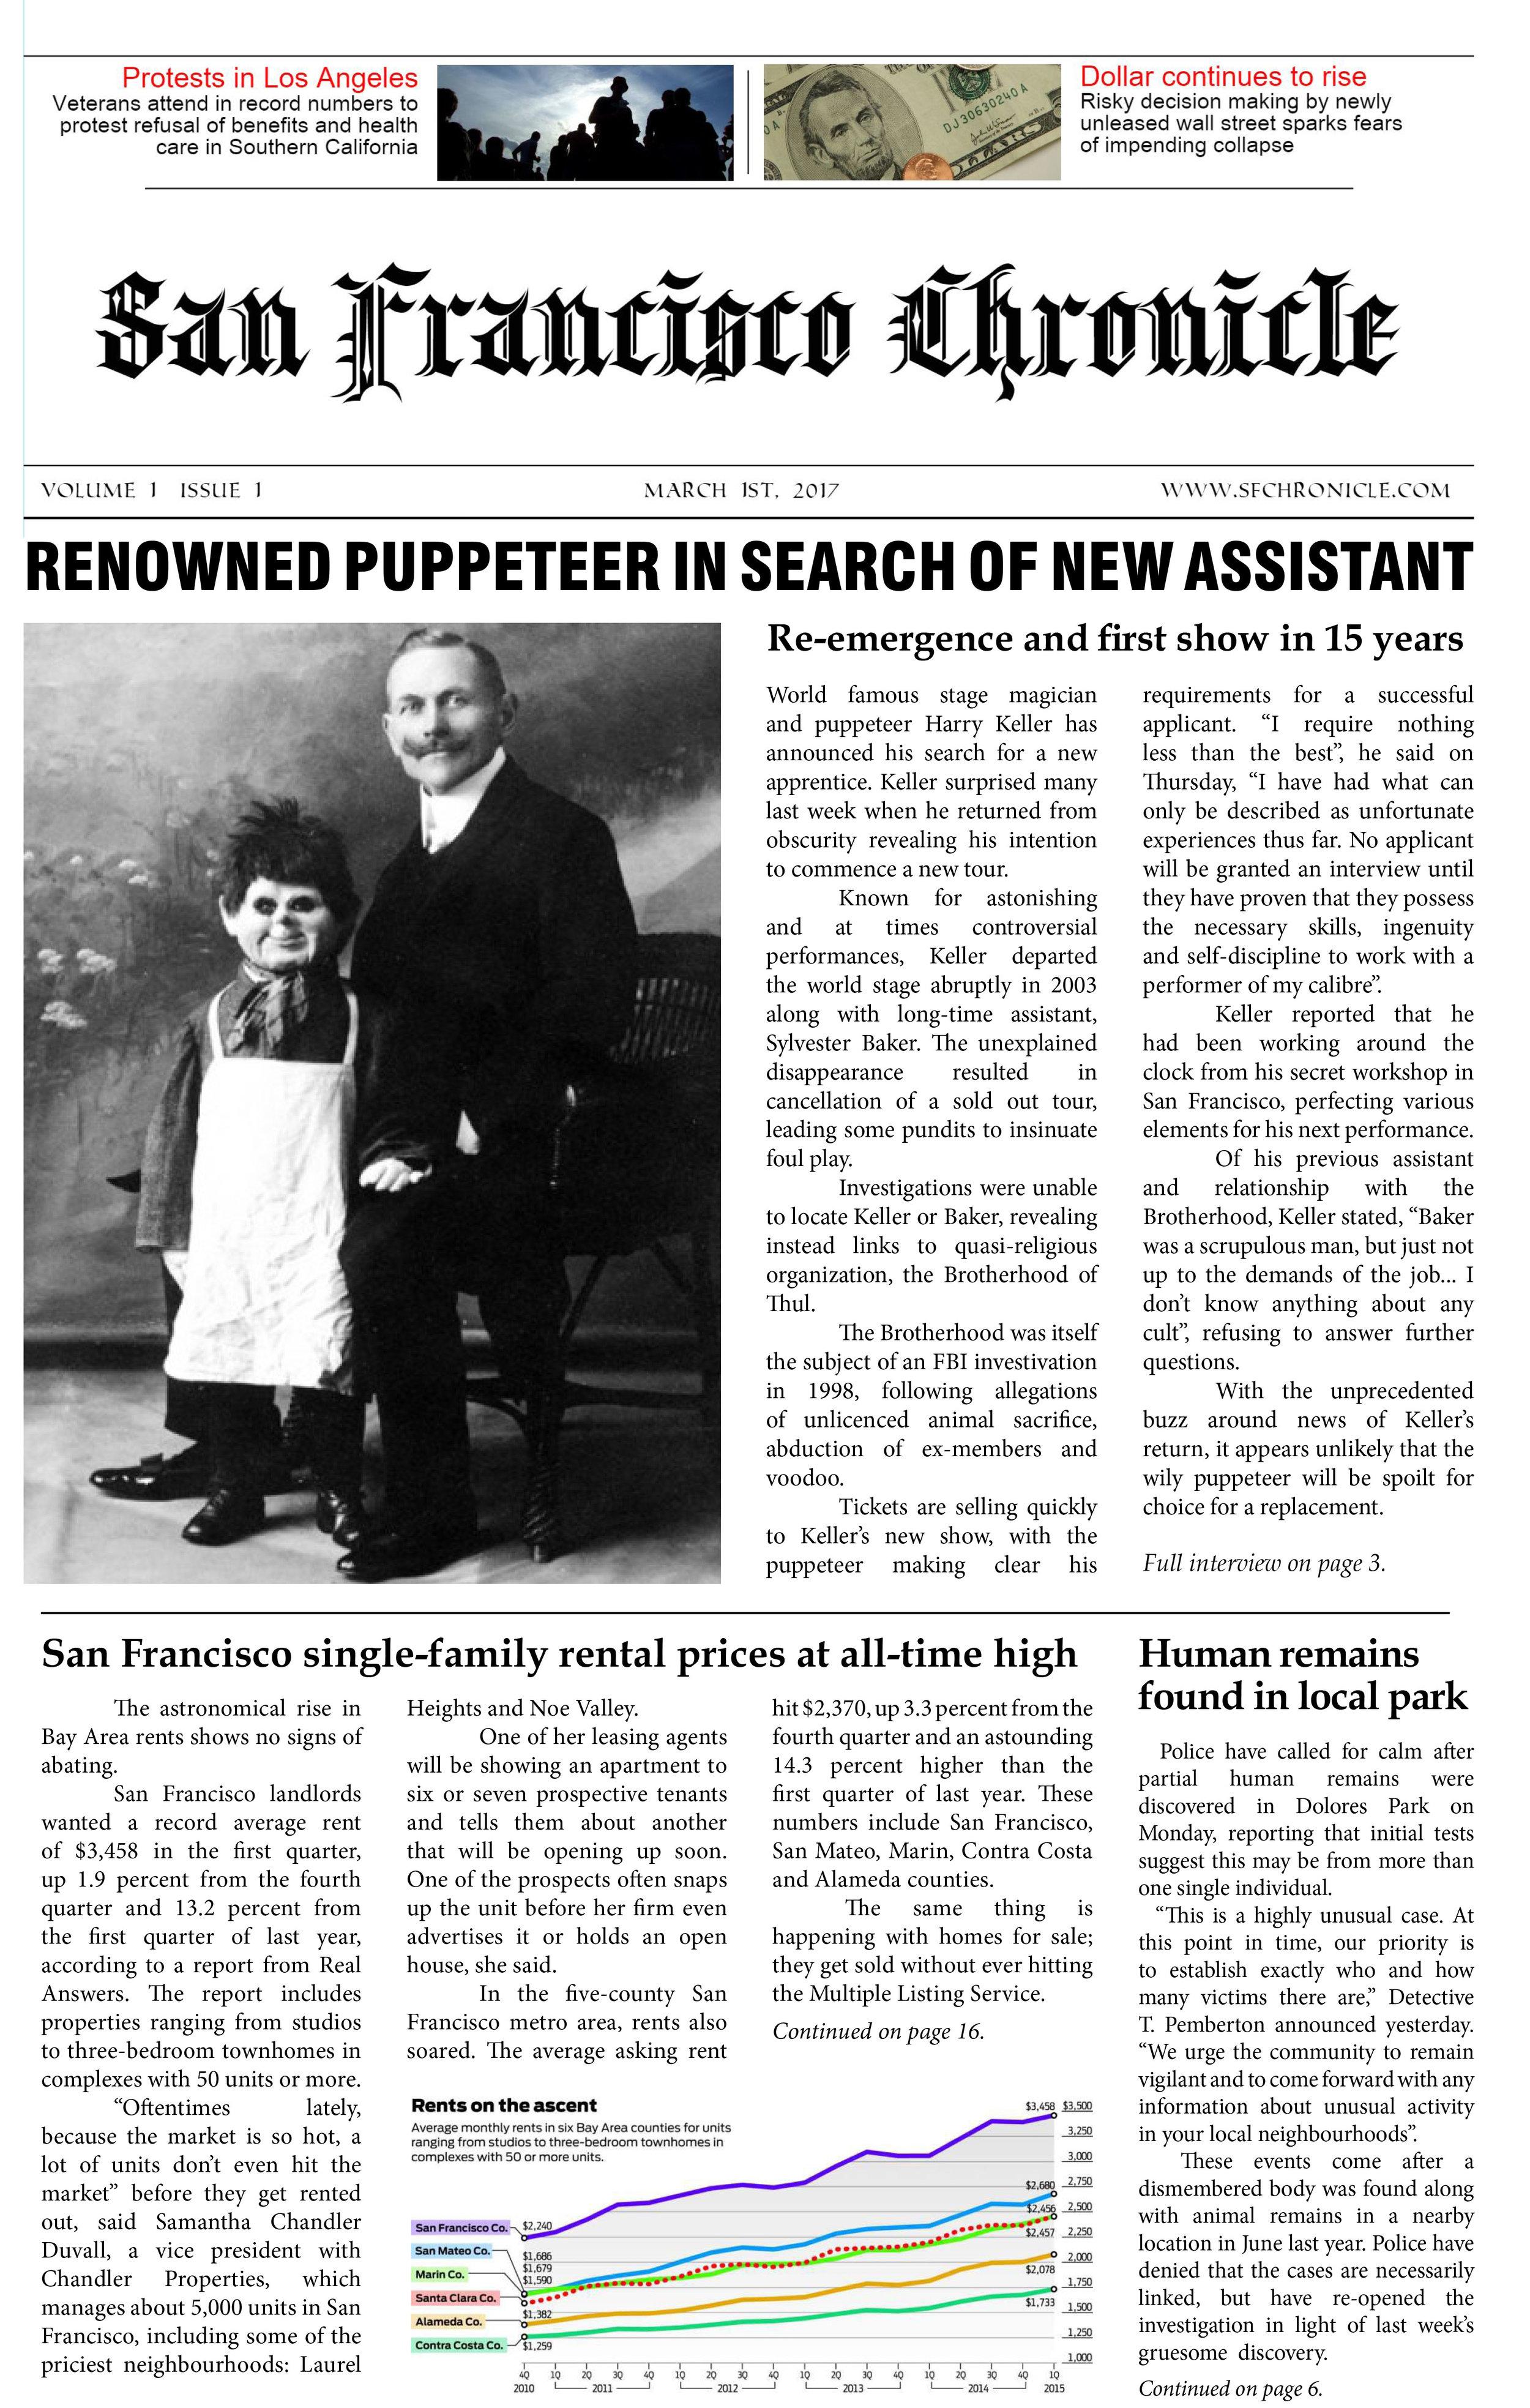 Newspaper Article 14Apr17.jpg